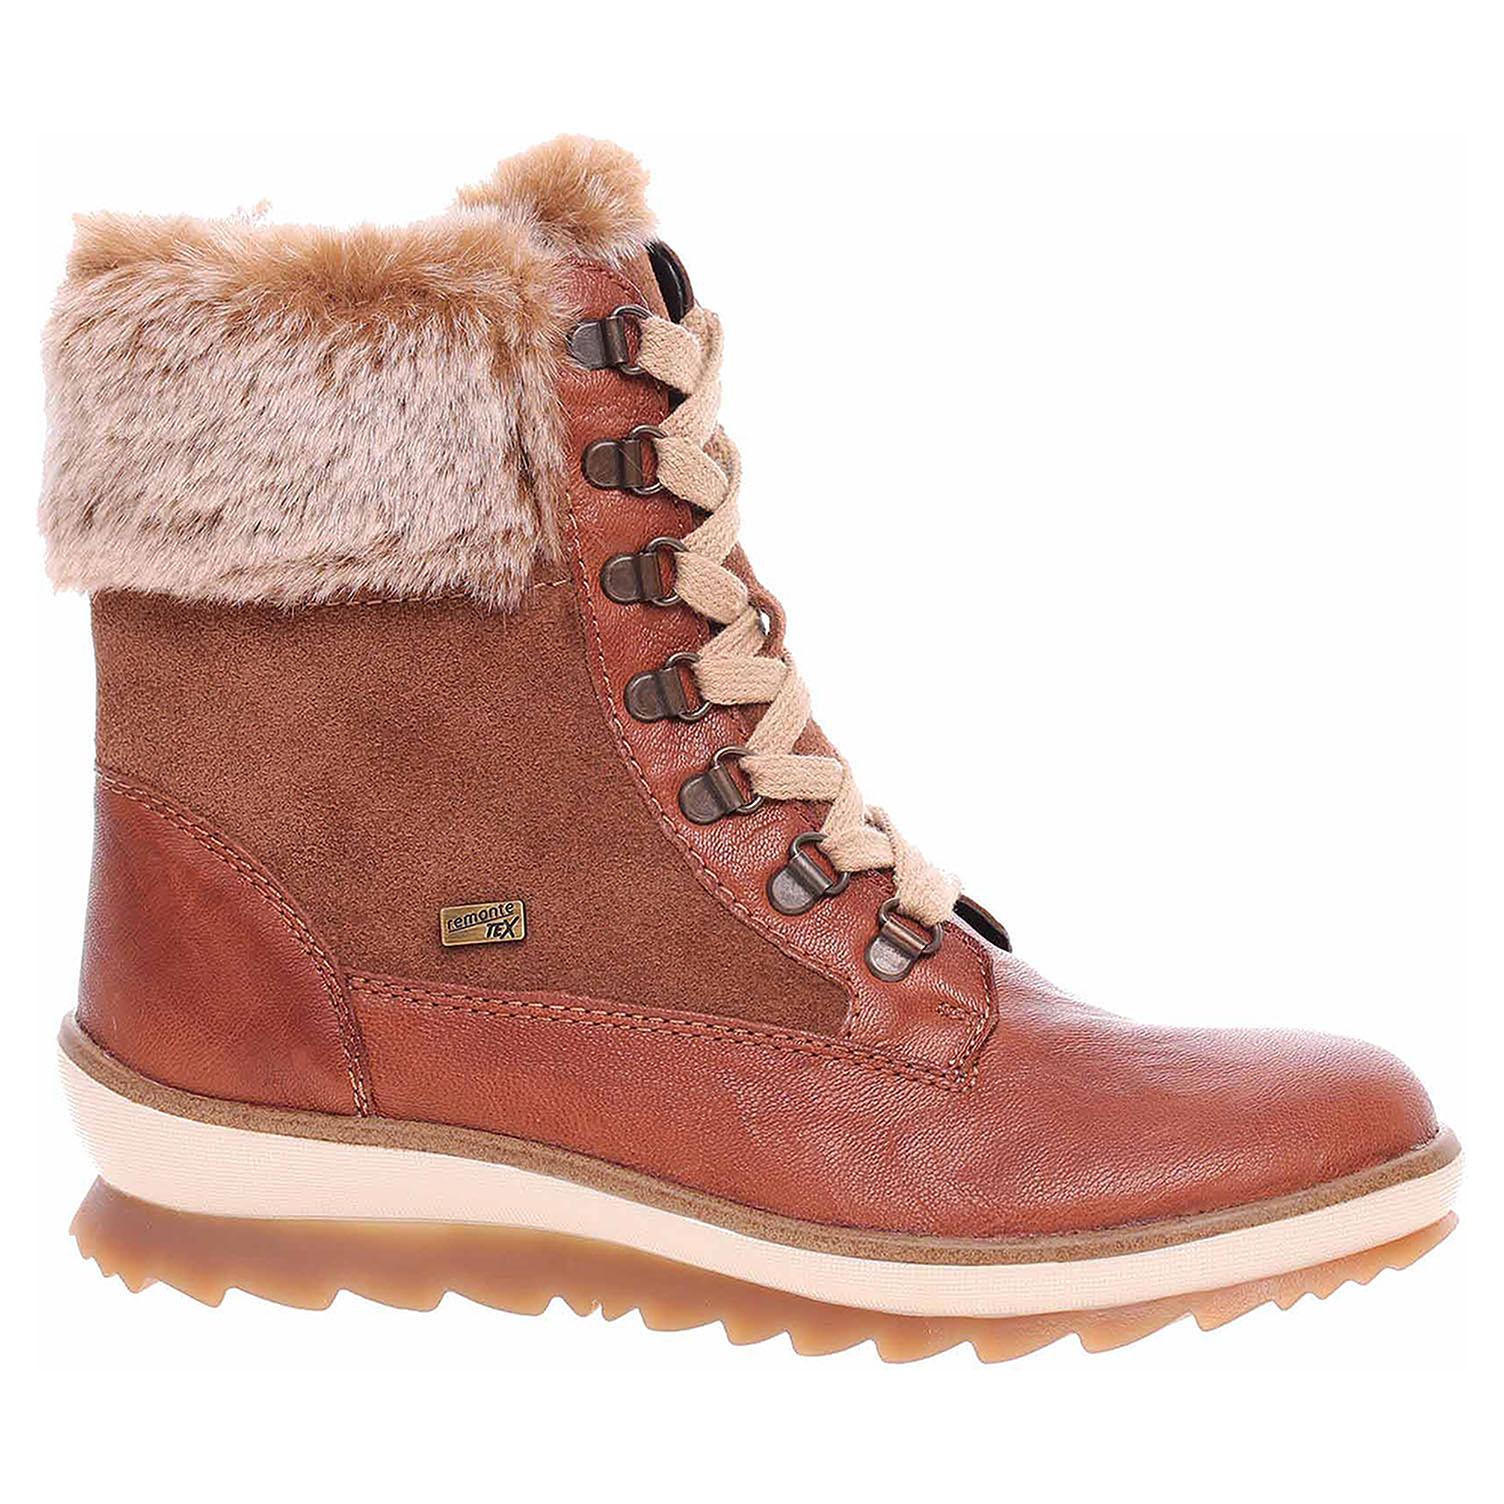 Dámská kotníková obuv Remonte R4375-23 braun R4375-23 39